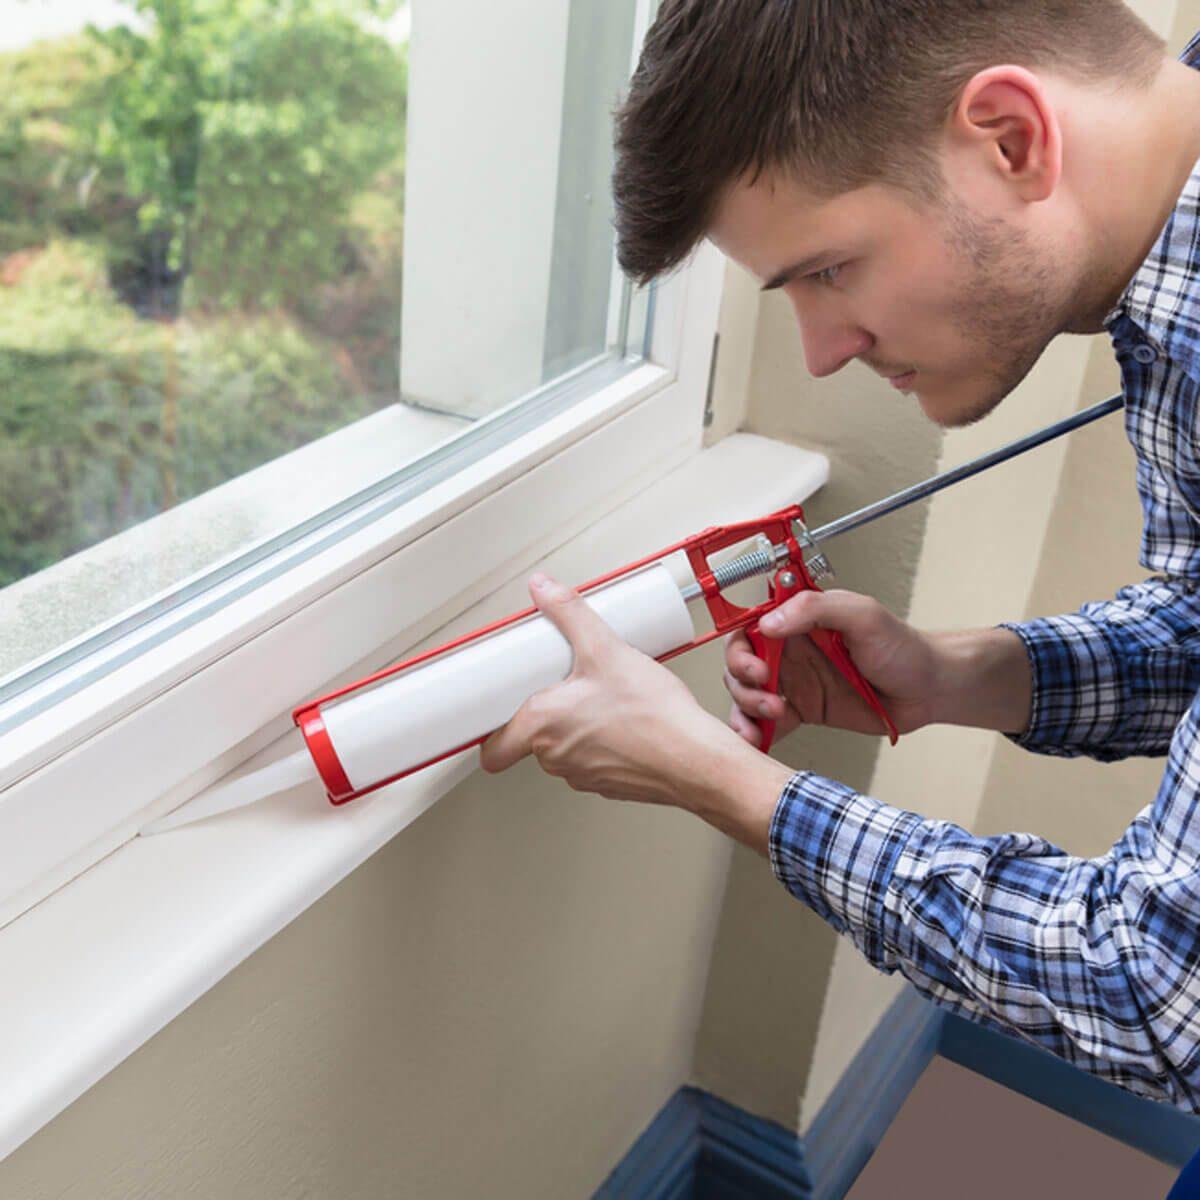 How to Keep House Warm: Caulk Windows and Doors